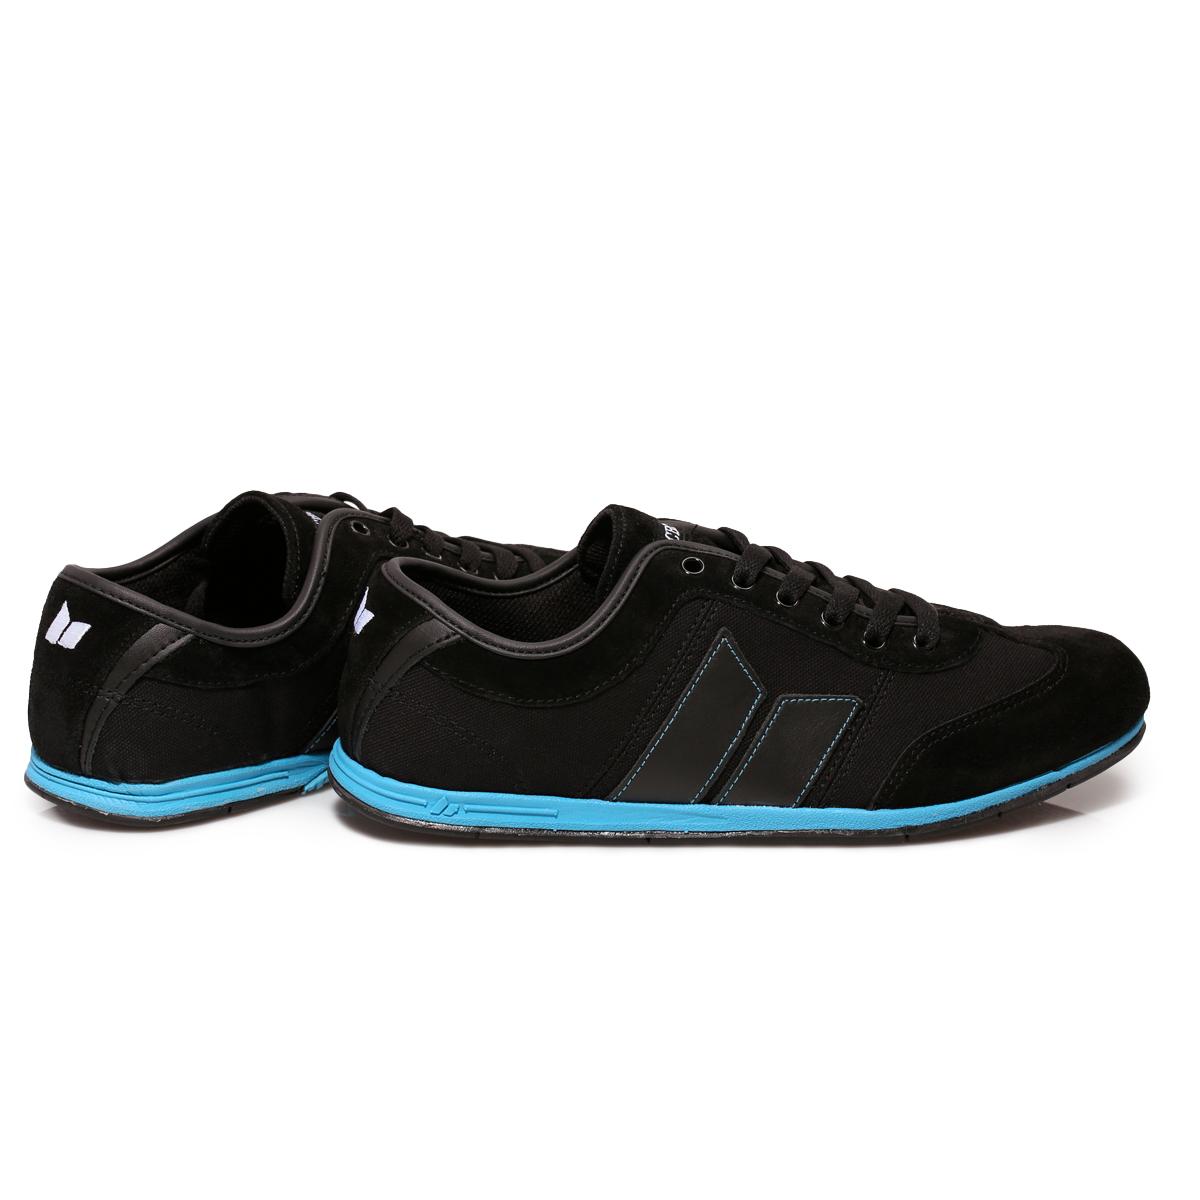 Macbeth London Shoes For Sale